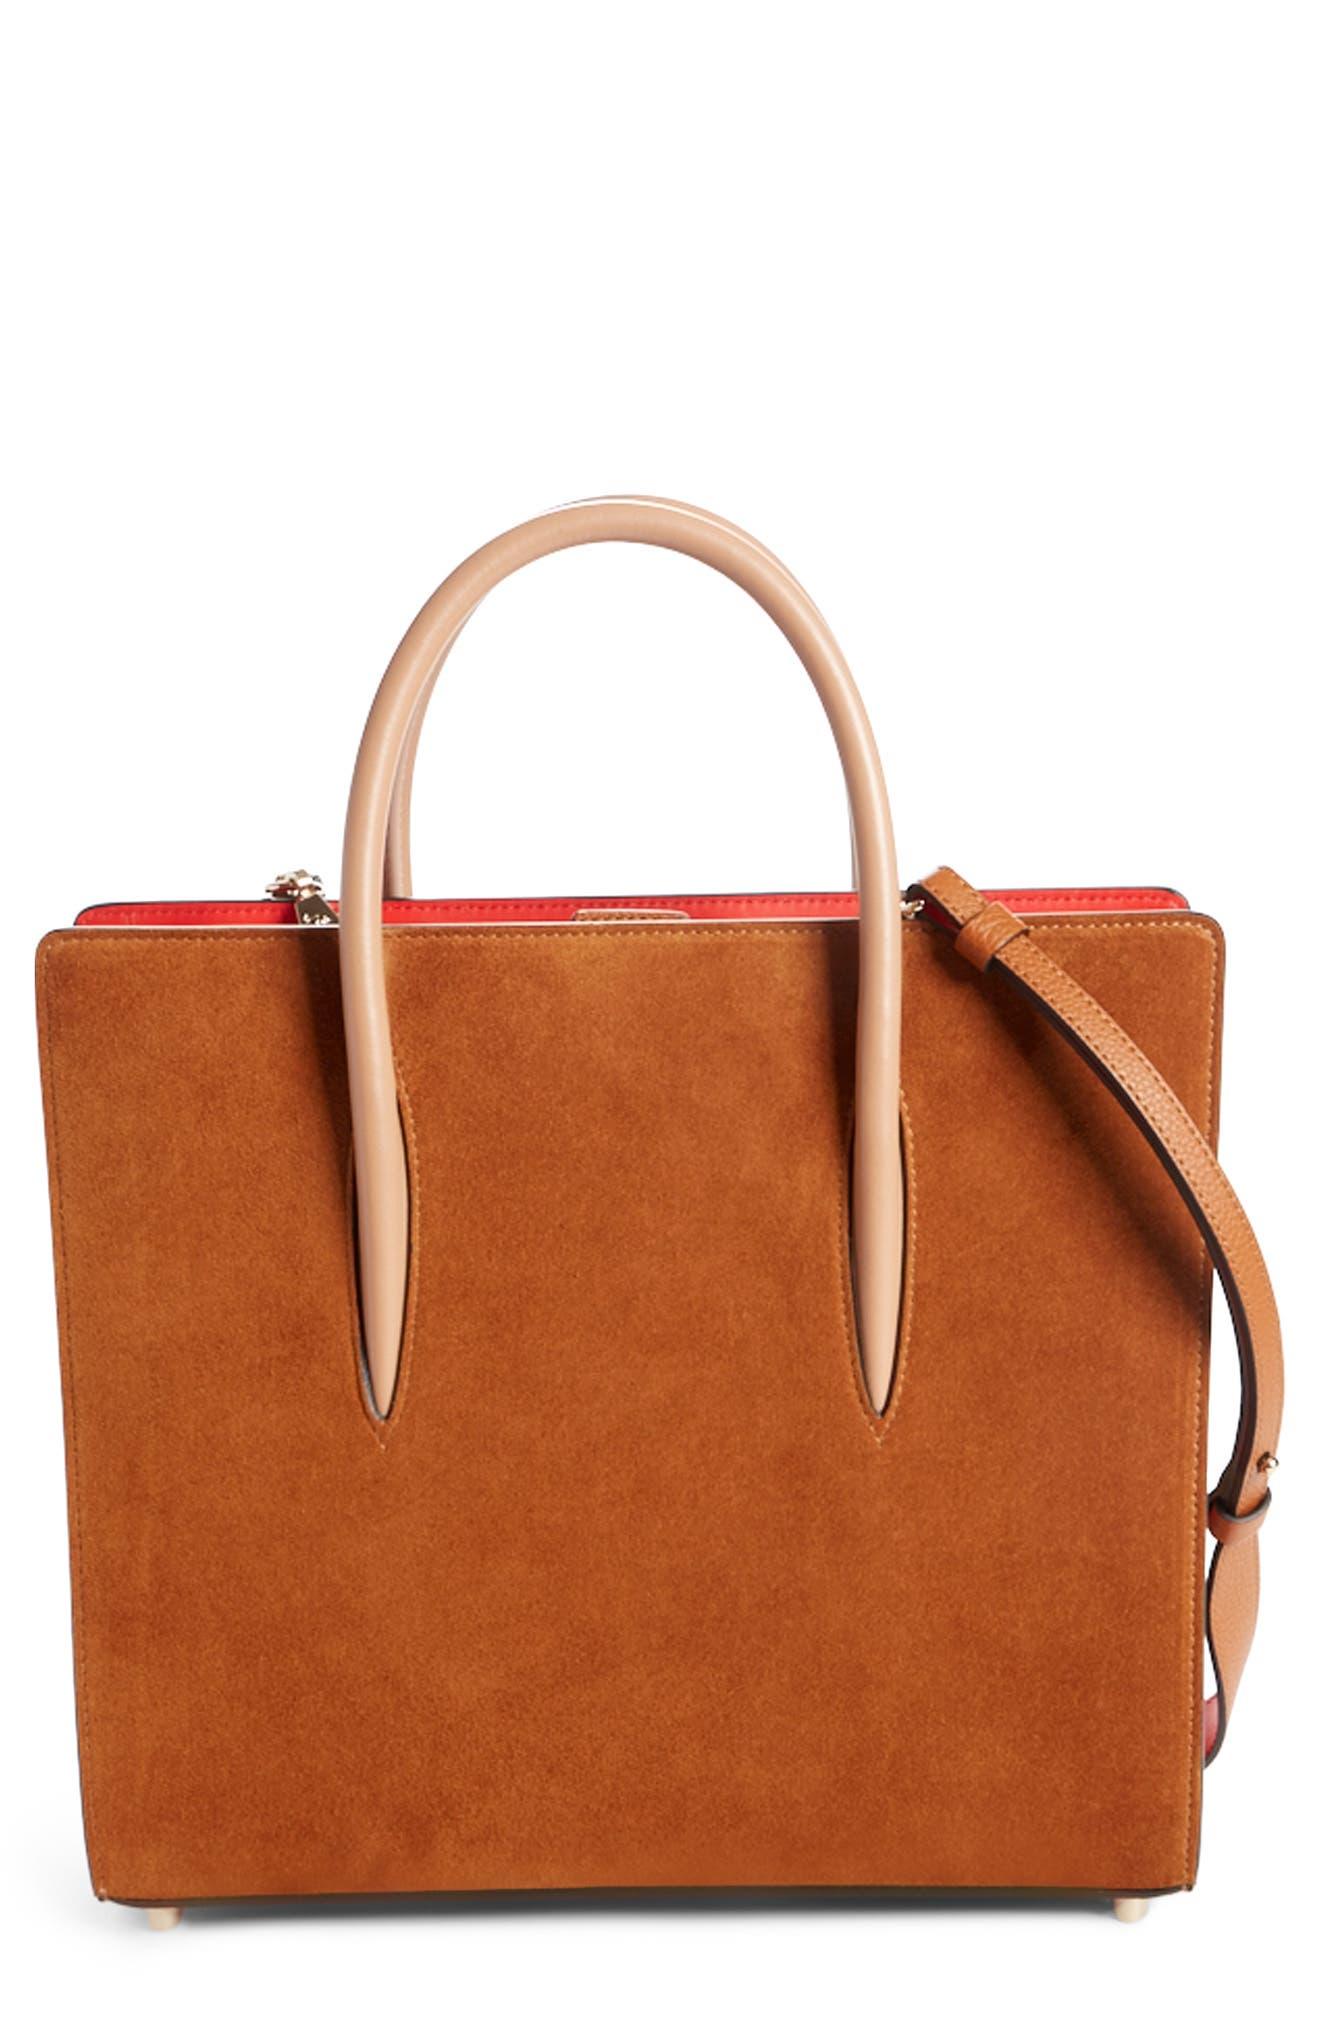 Medium Paloma Loubiwoodstock Suede & Leather Tote,                         Main,                         color, 247